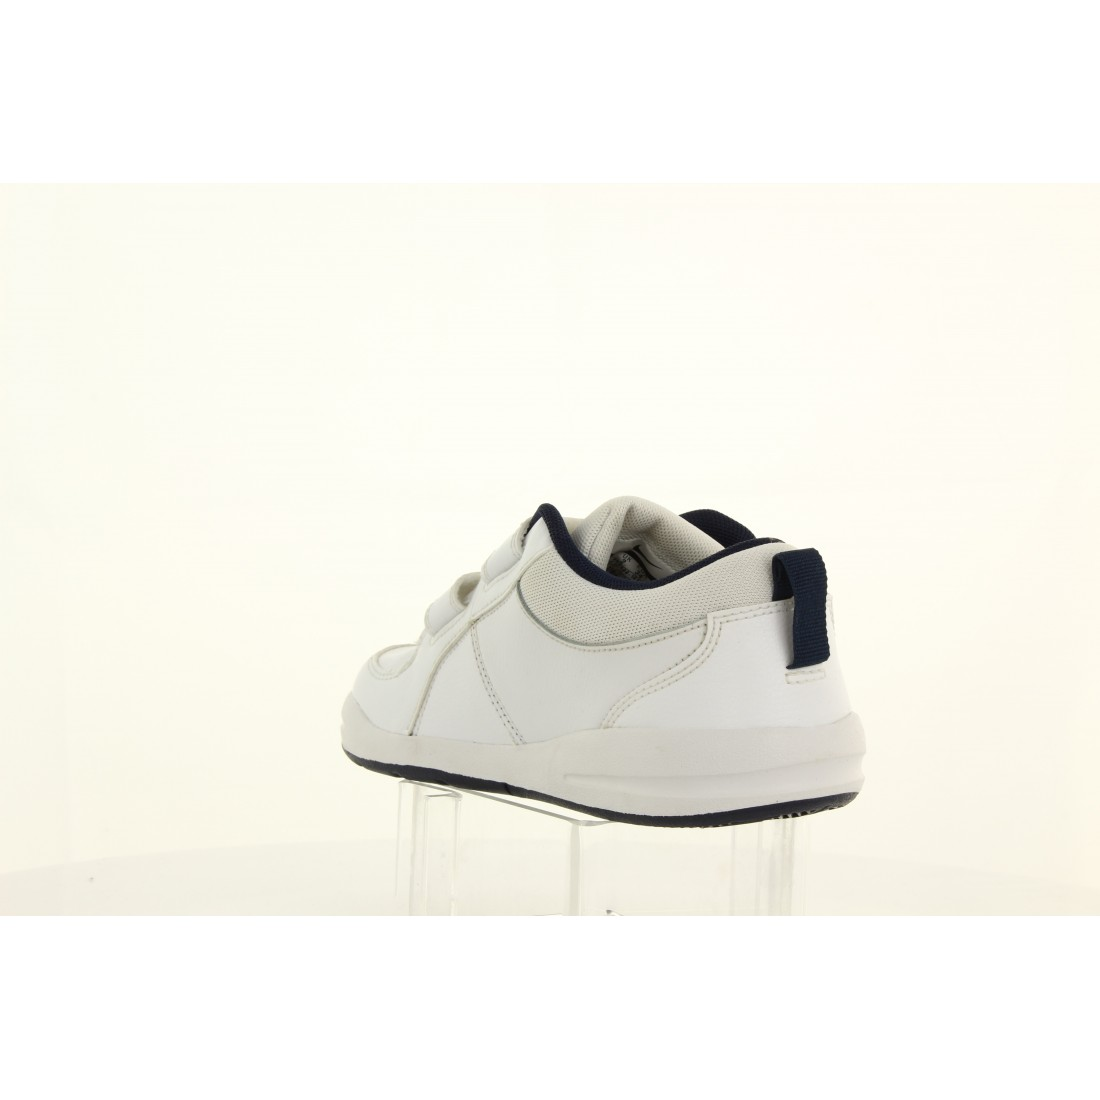 Buty Nike Pico 4 454500 101